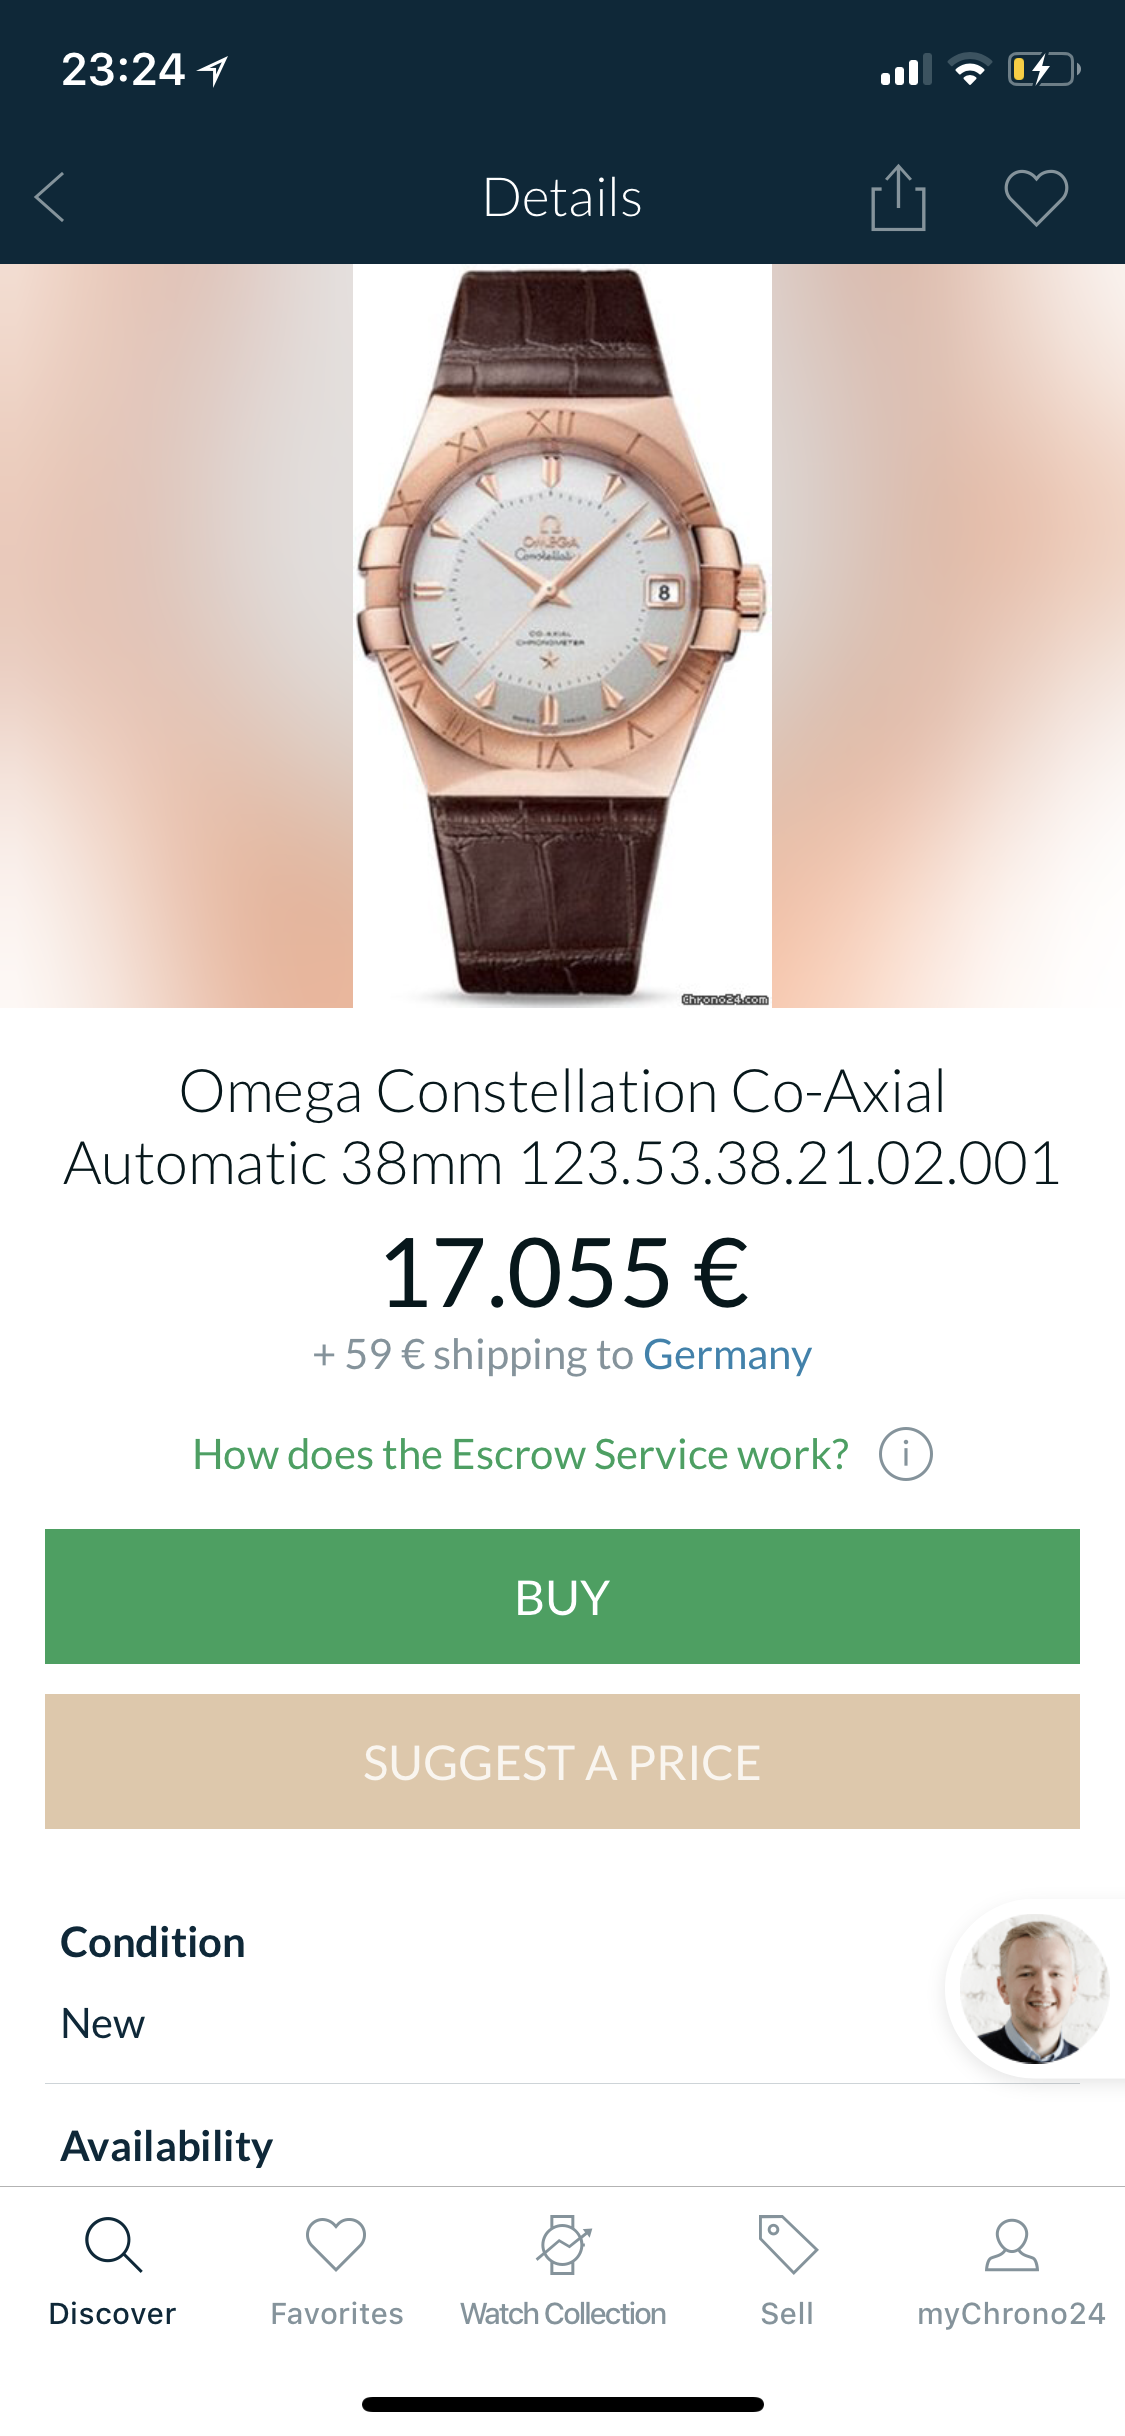 Omega Constellation limited 1952 vàng hồng 18k dây da size 38mm